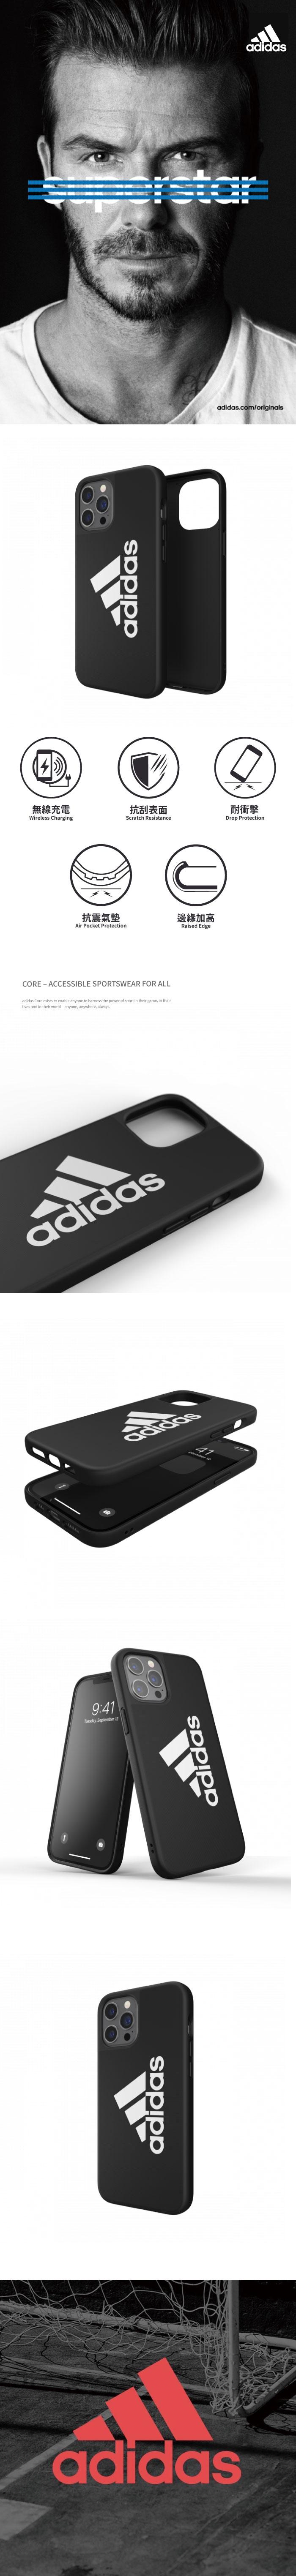 Adidas|iPhone 12 Pro Max 手機殼 Sport 經典標誌 黑色